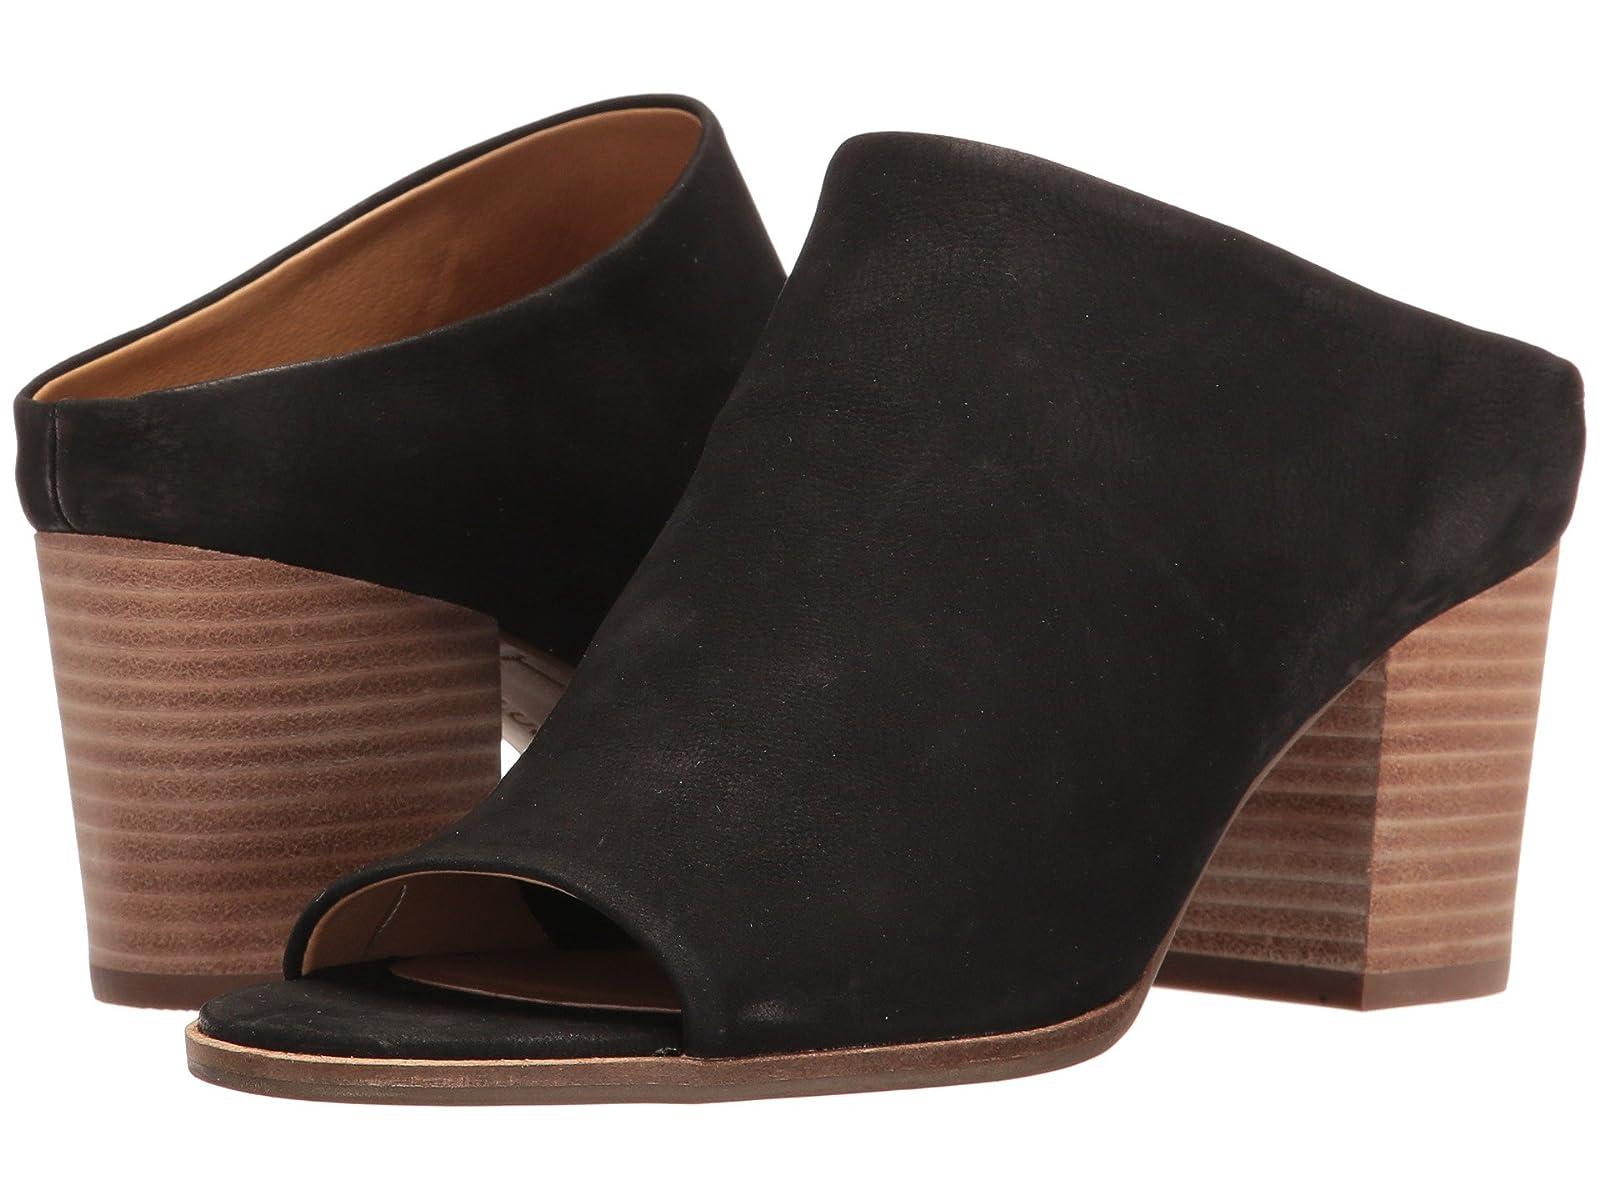 Lucky Brand OrganzaCheap and distinctive eye-catching shoes